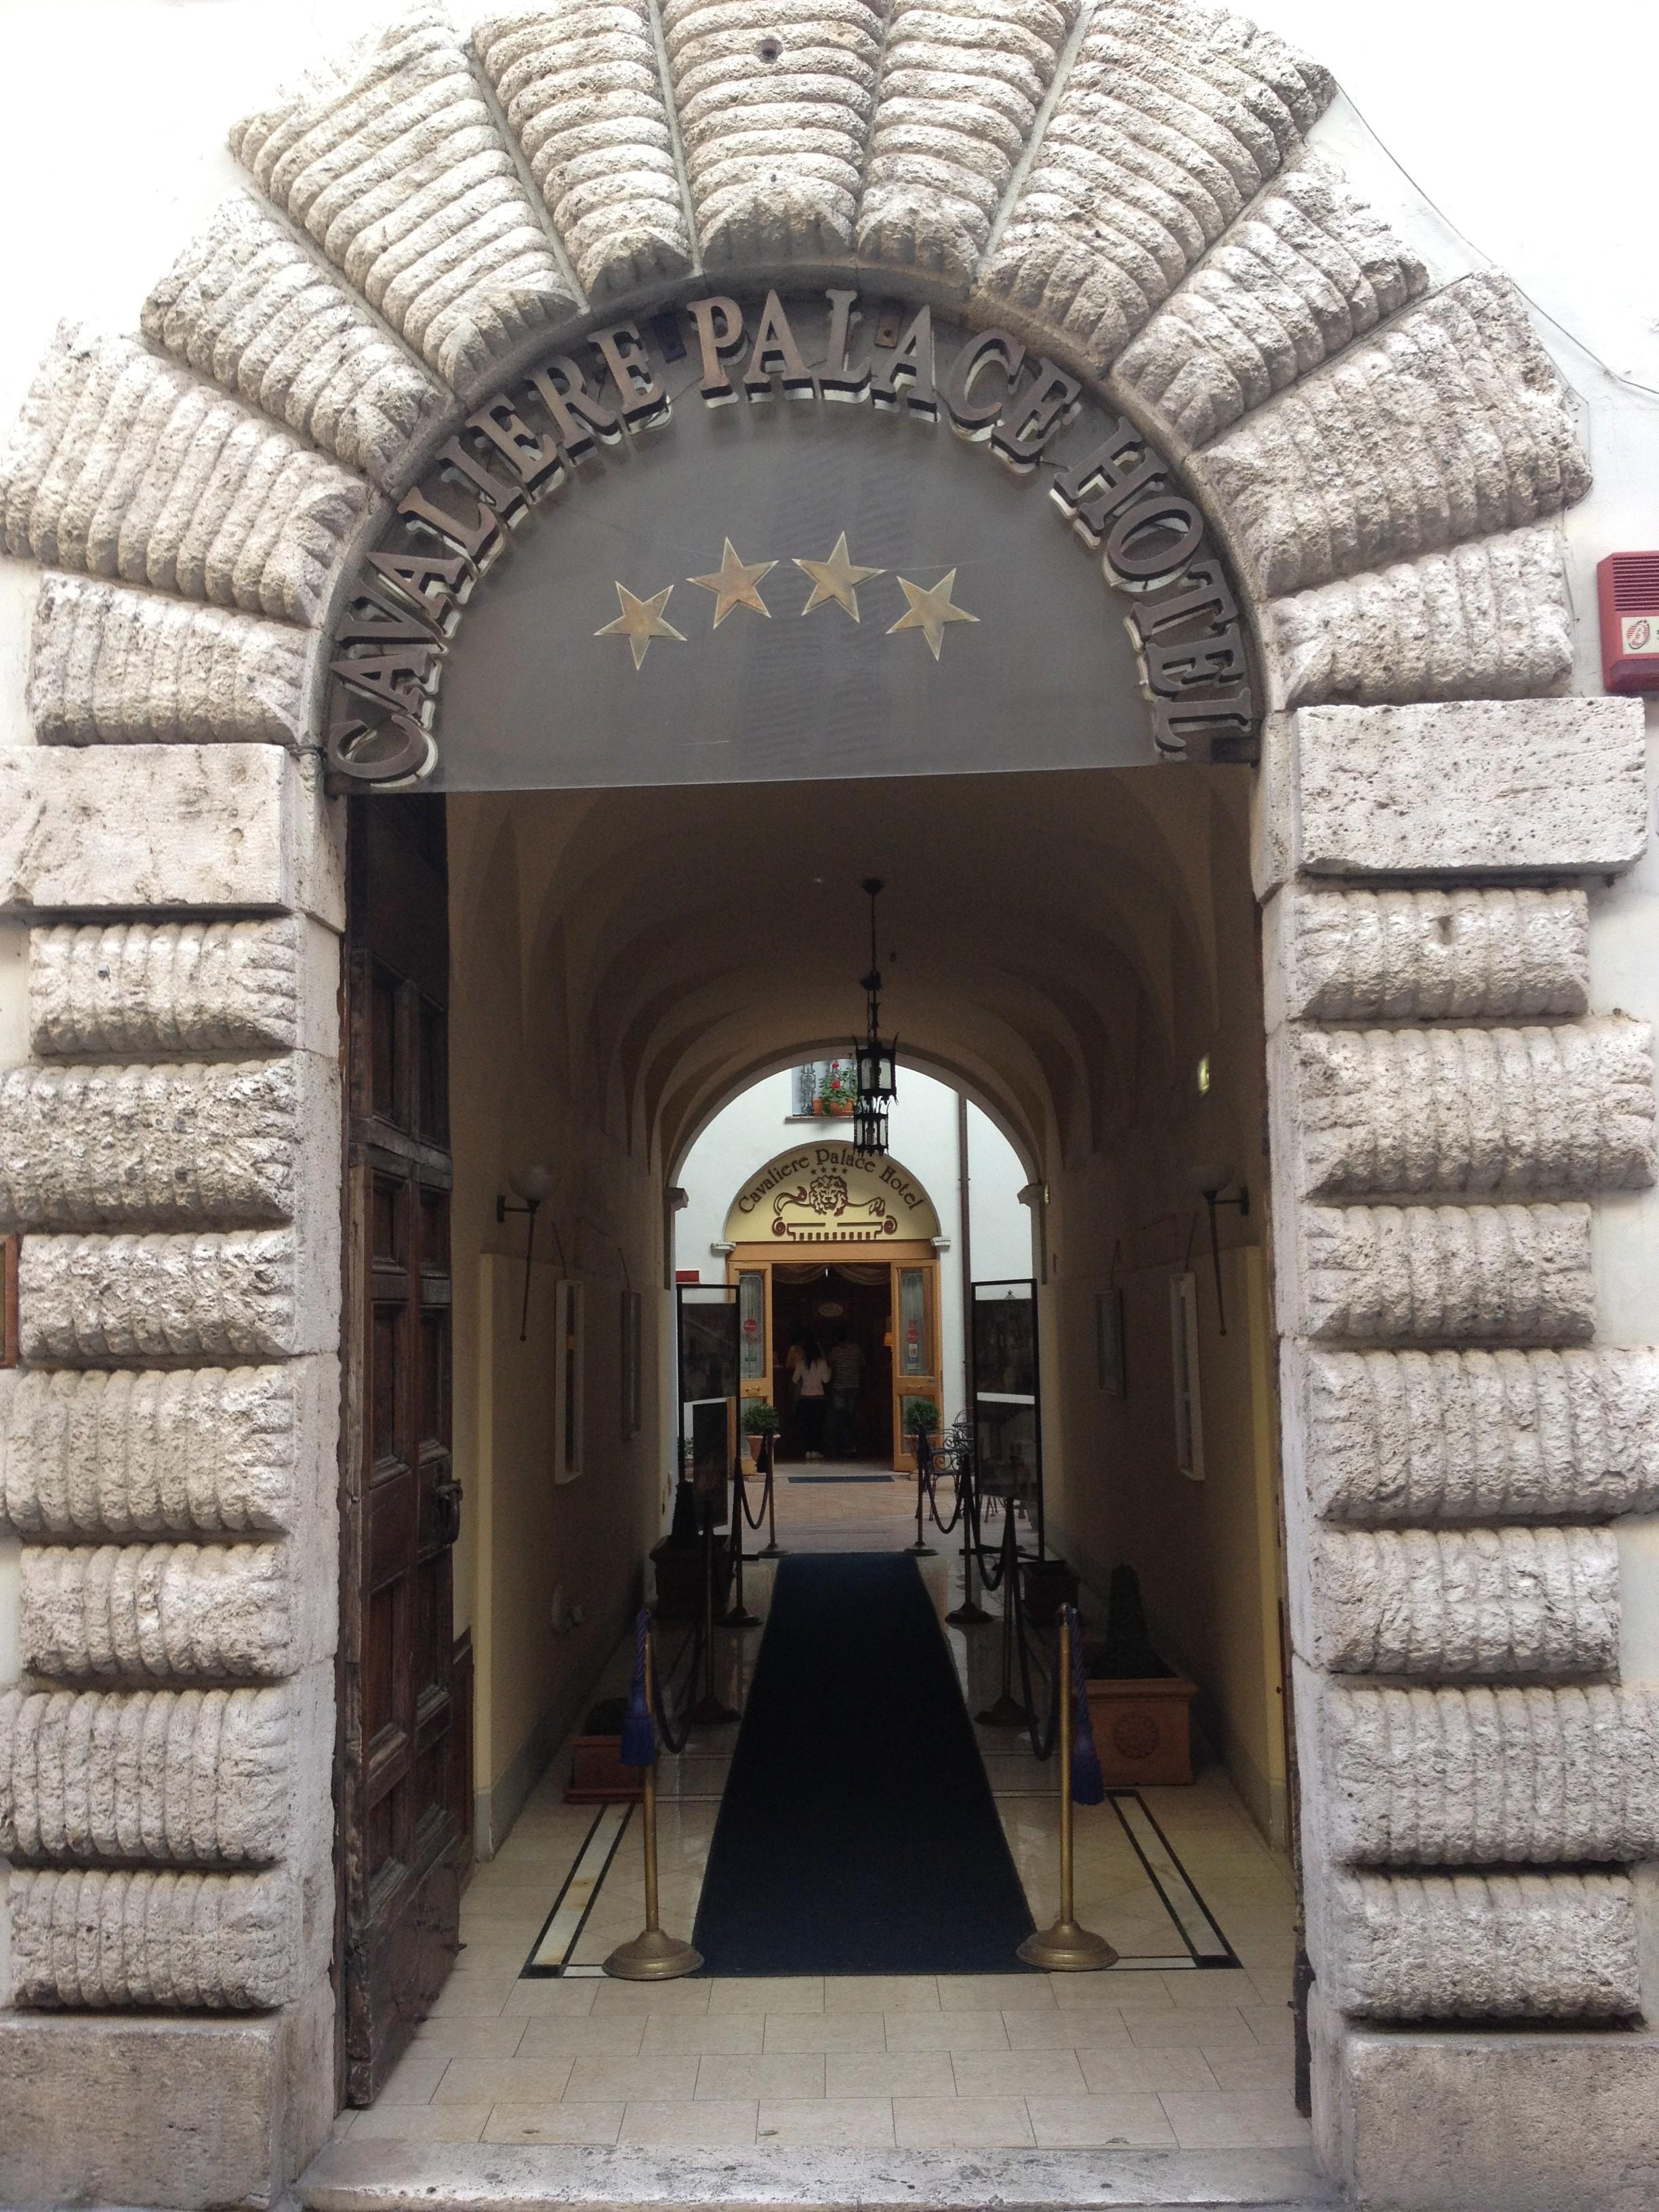 Cavaliere Palace Hotel, бывшая резиденция кардинала Аккорамбони делла Вальнерина